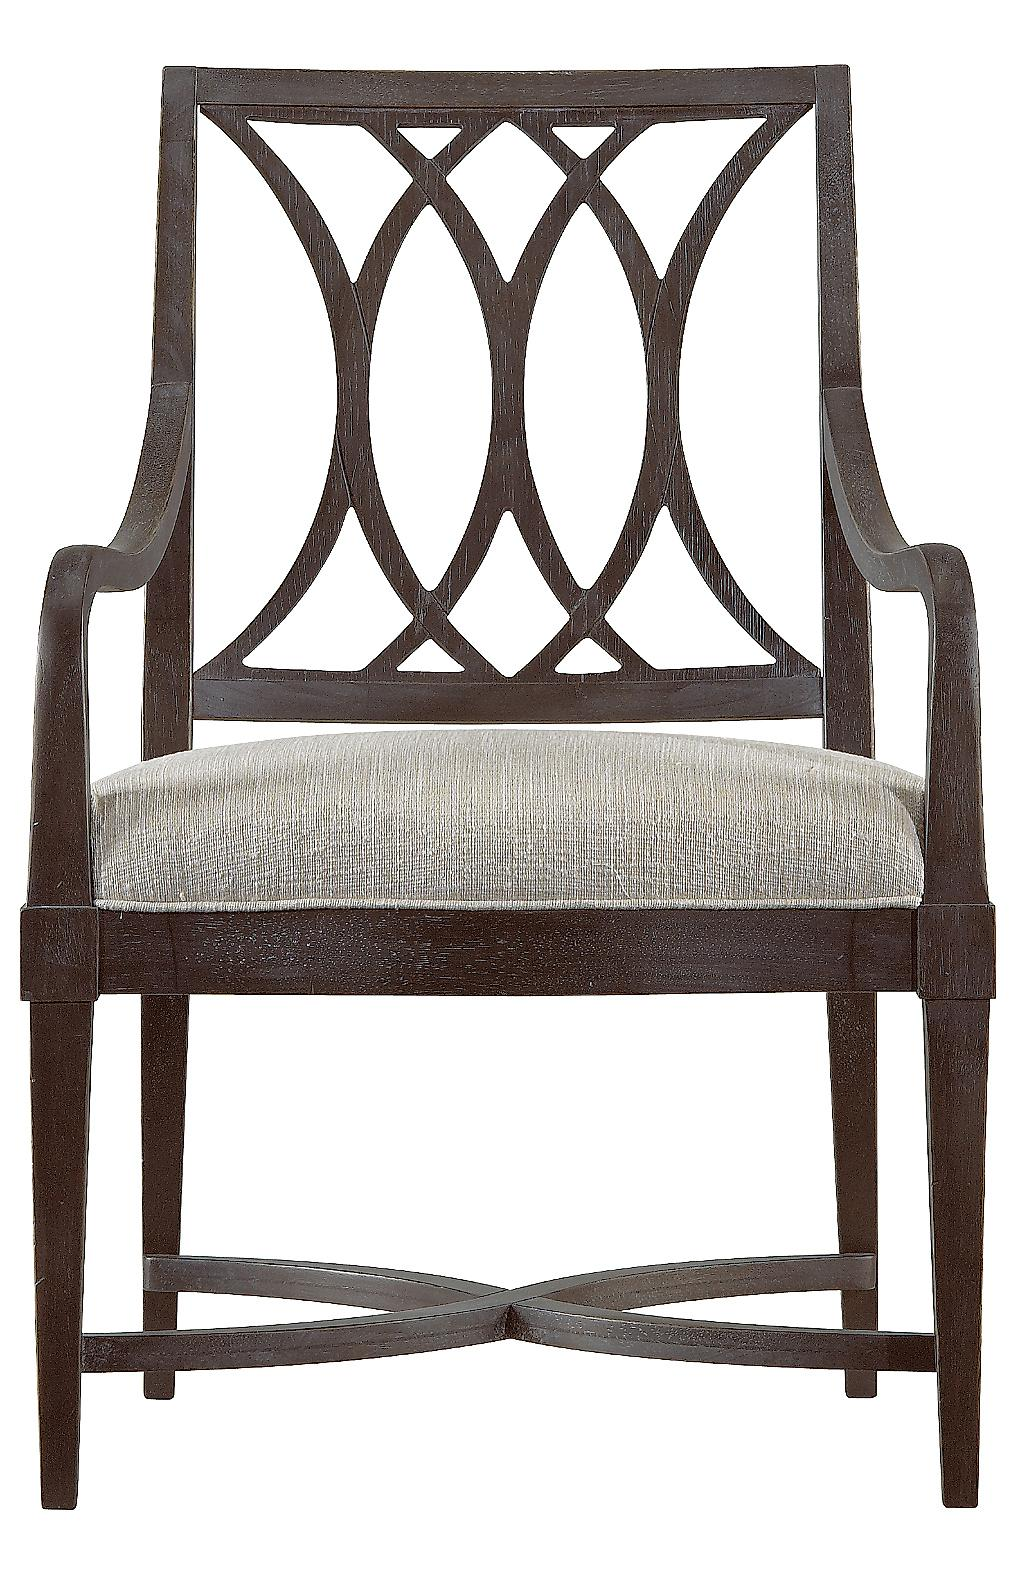 Stanley Furniture Coastal Living Resort Heritage Coast Arm Chair - Item Number: 062-11-70